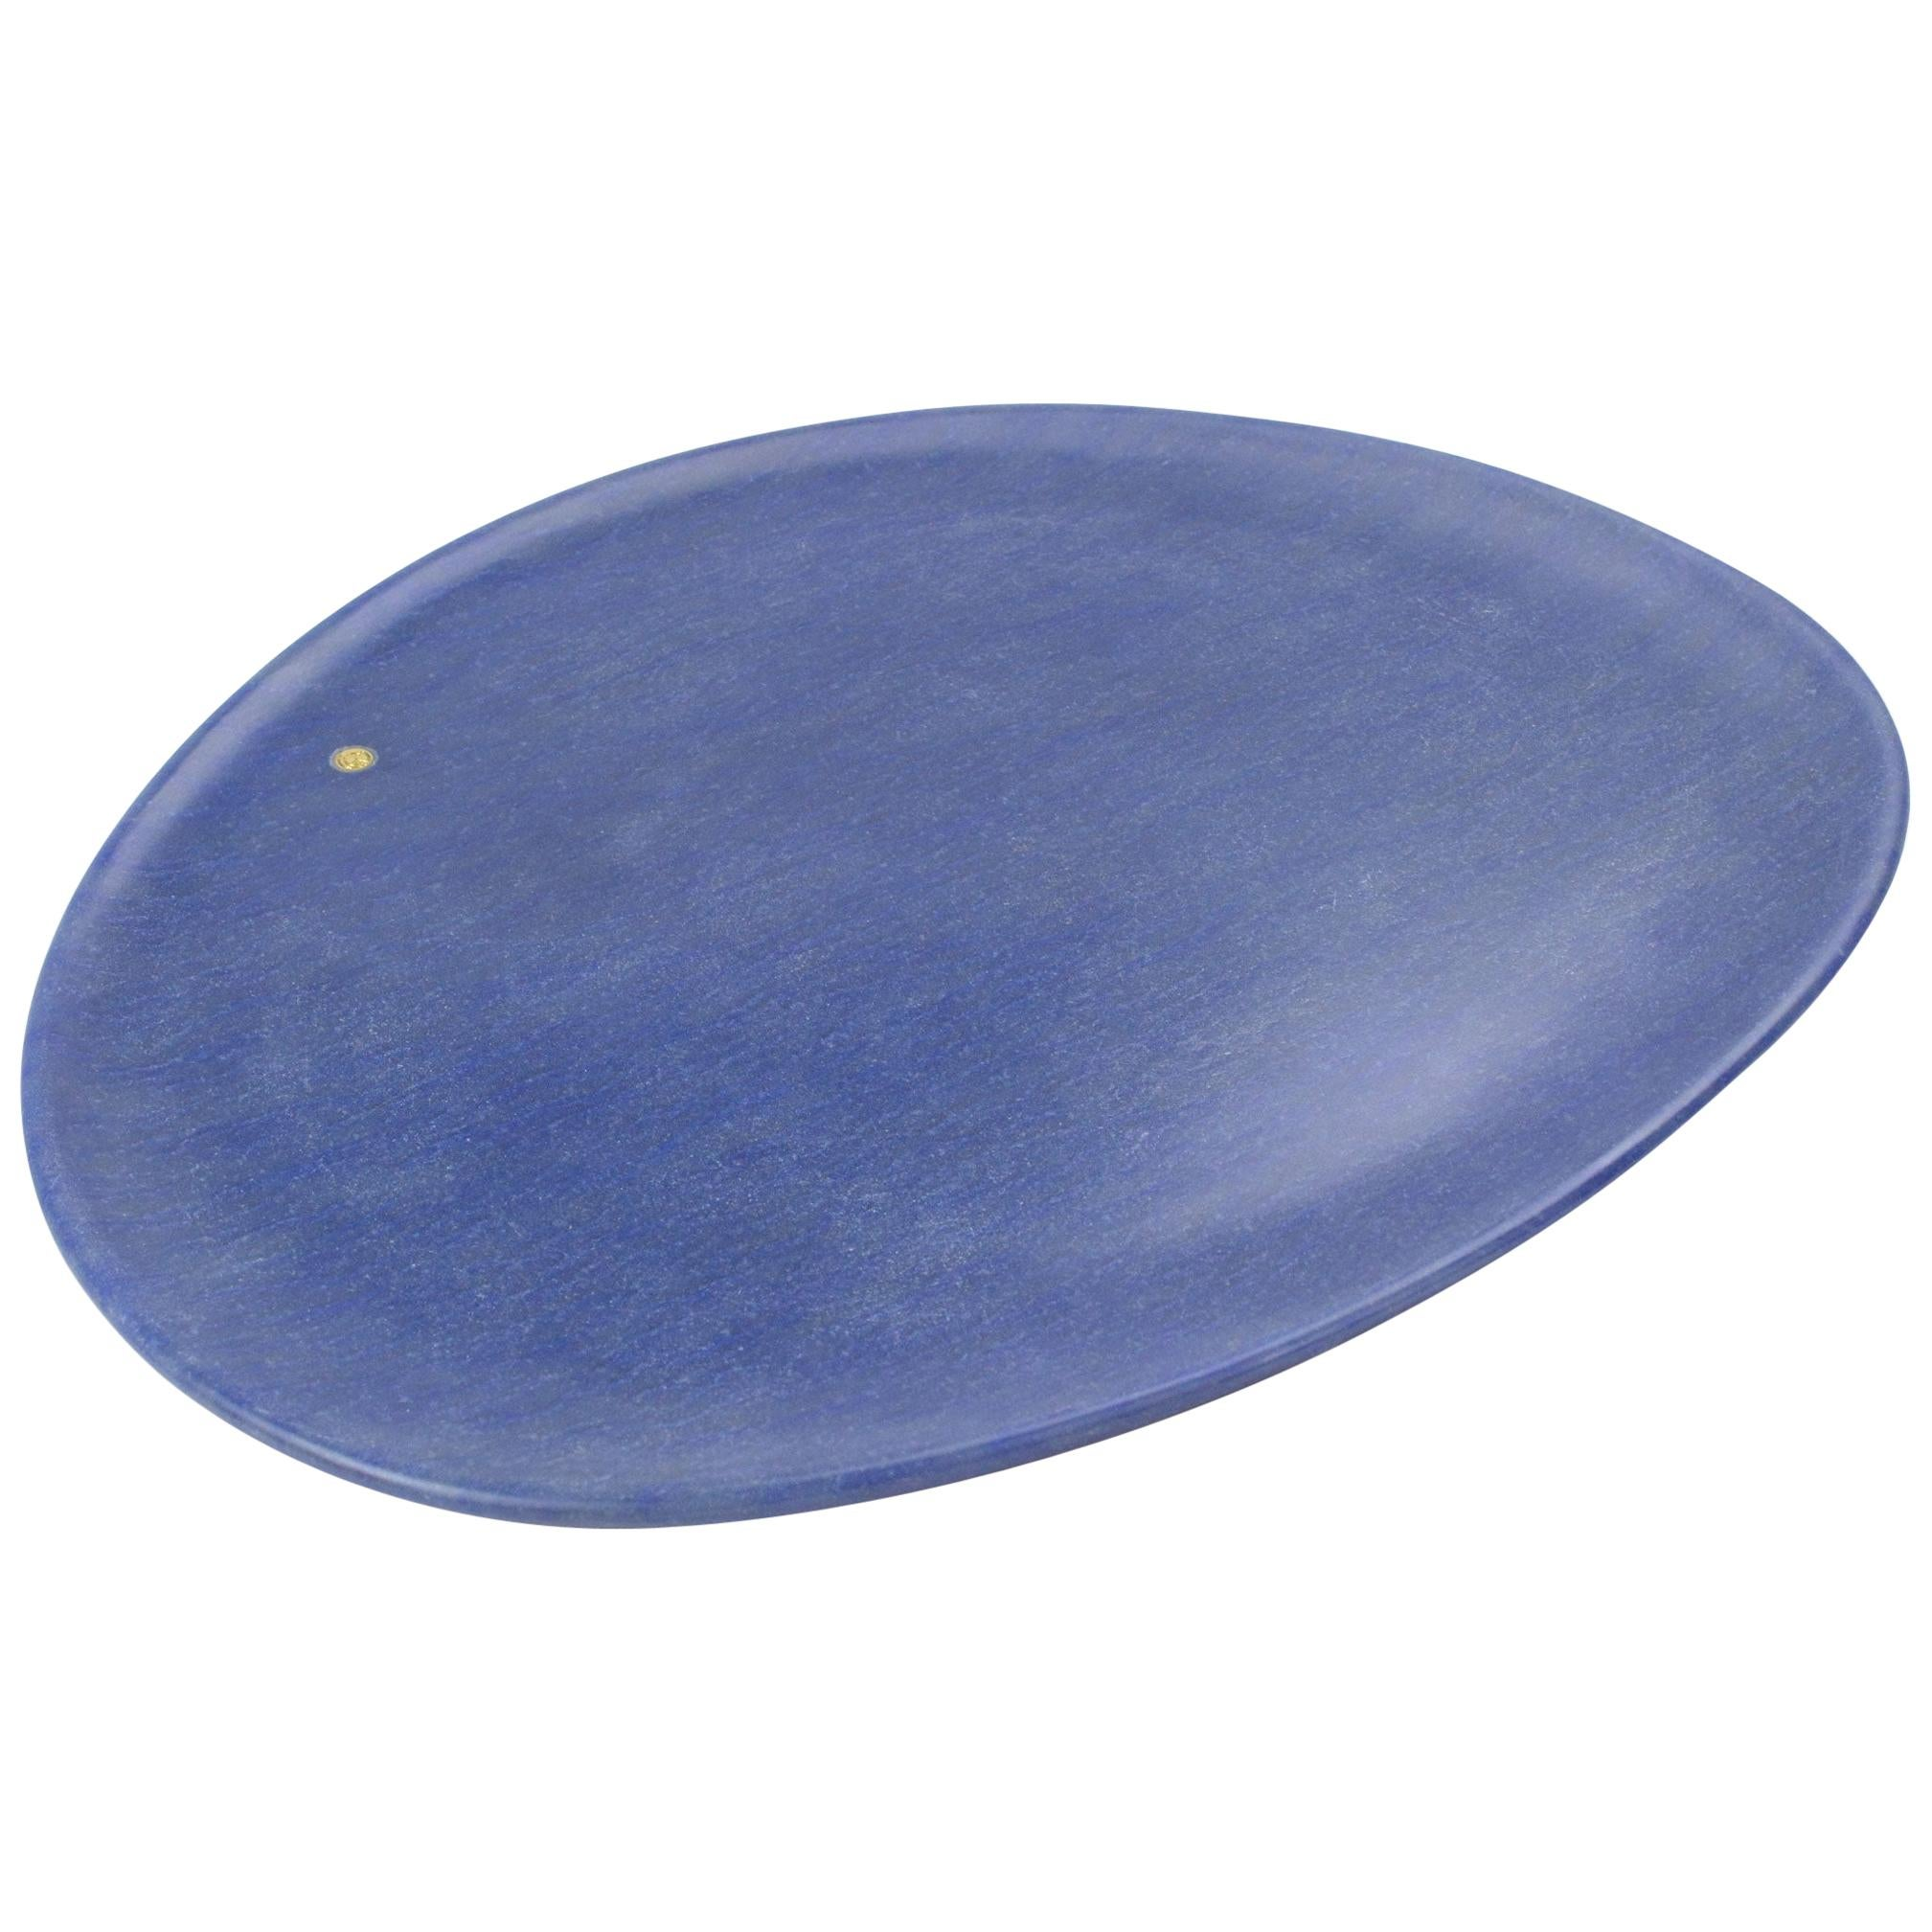 Handmade Plate in Blue Azul Macaubas Contemporary Design by Pieruga Marble Italy